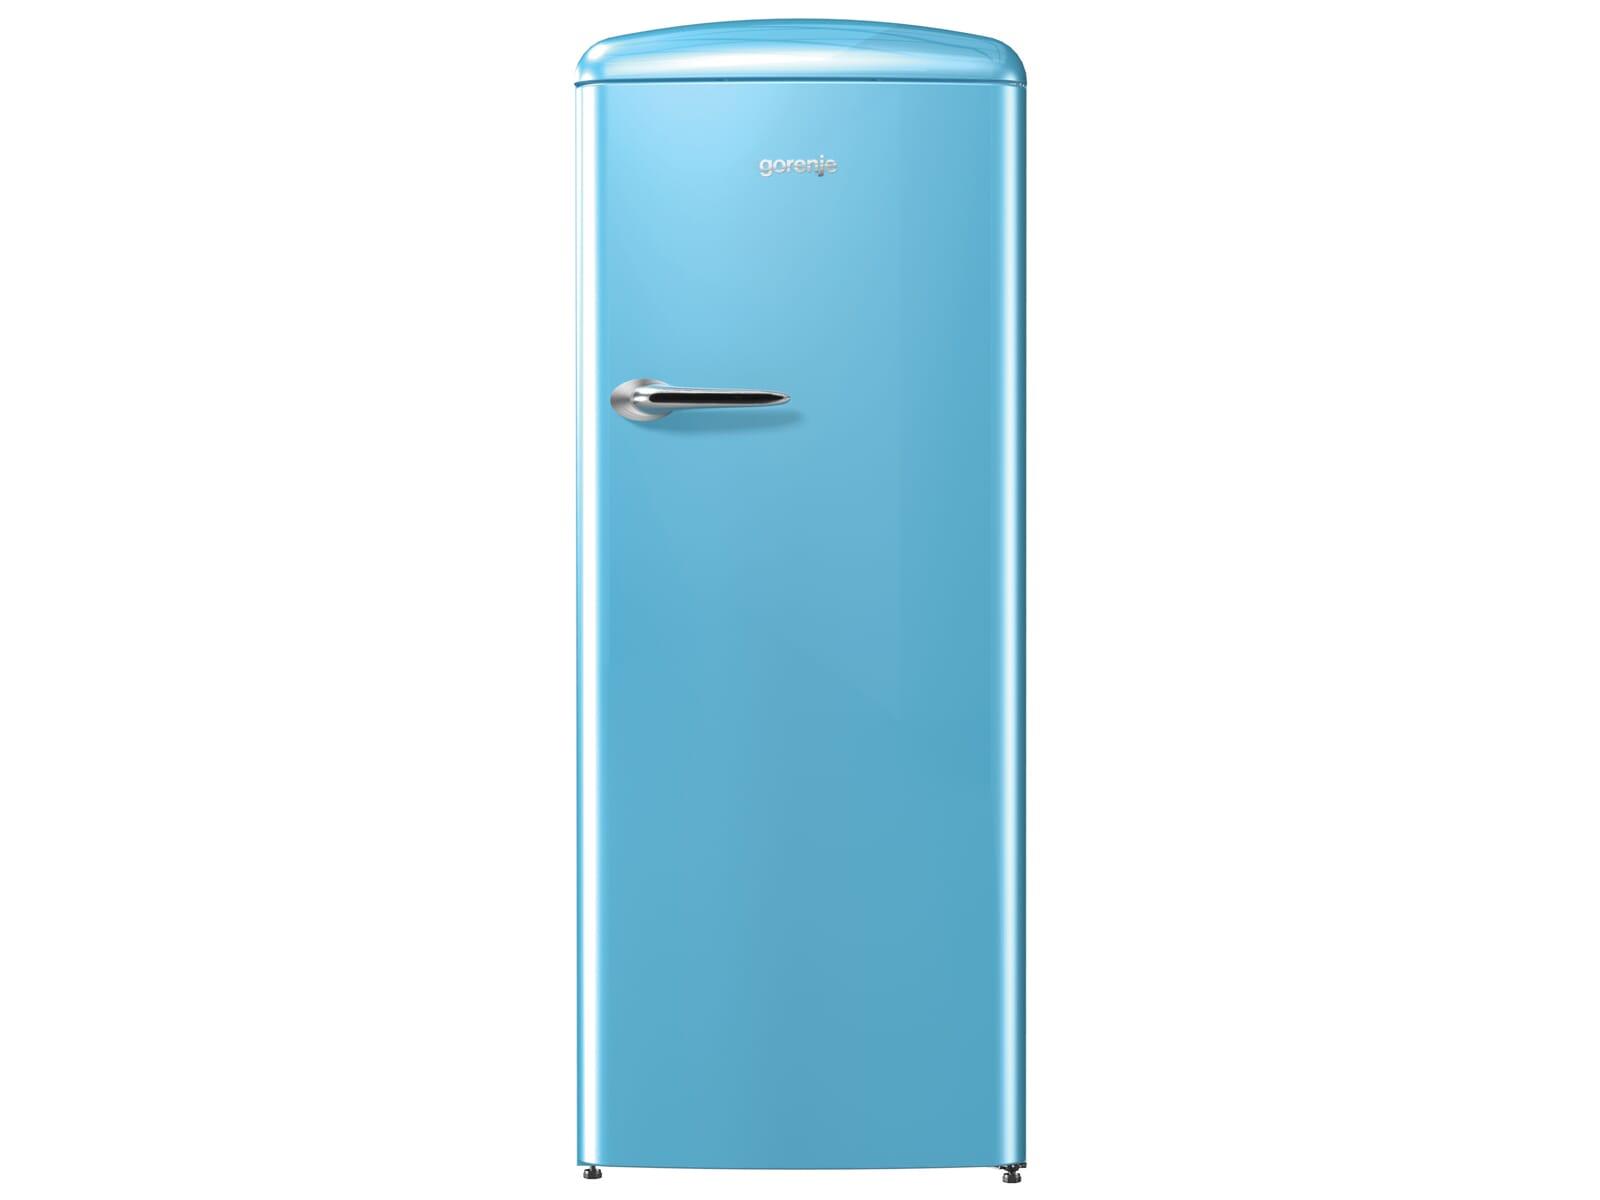 Gorenje Kühlschrank Orange : Kühlschrank retro blau kühlschrank retro weiß raffiflorist